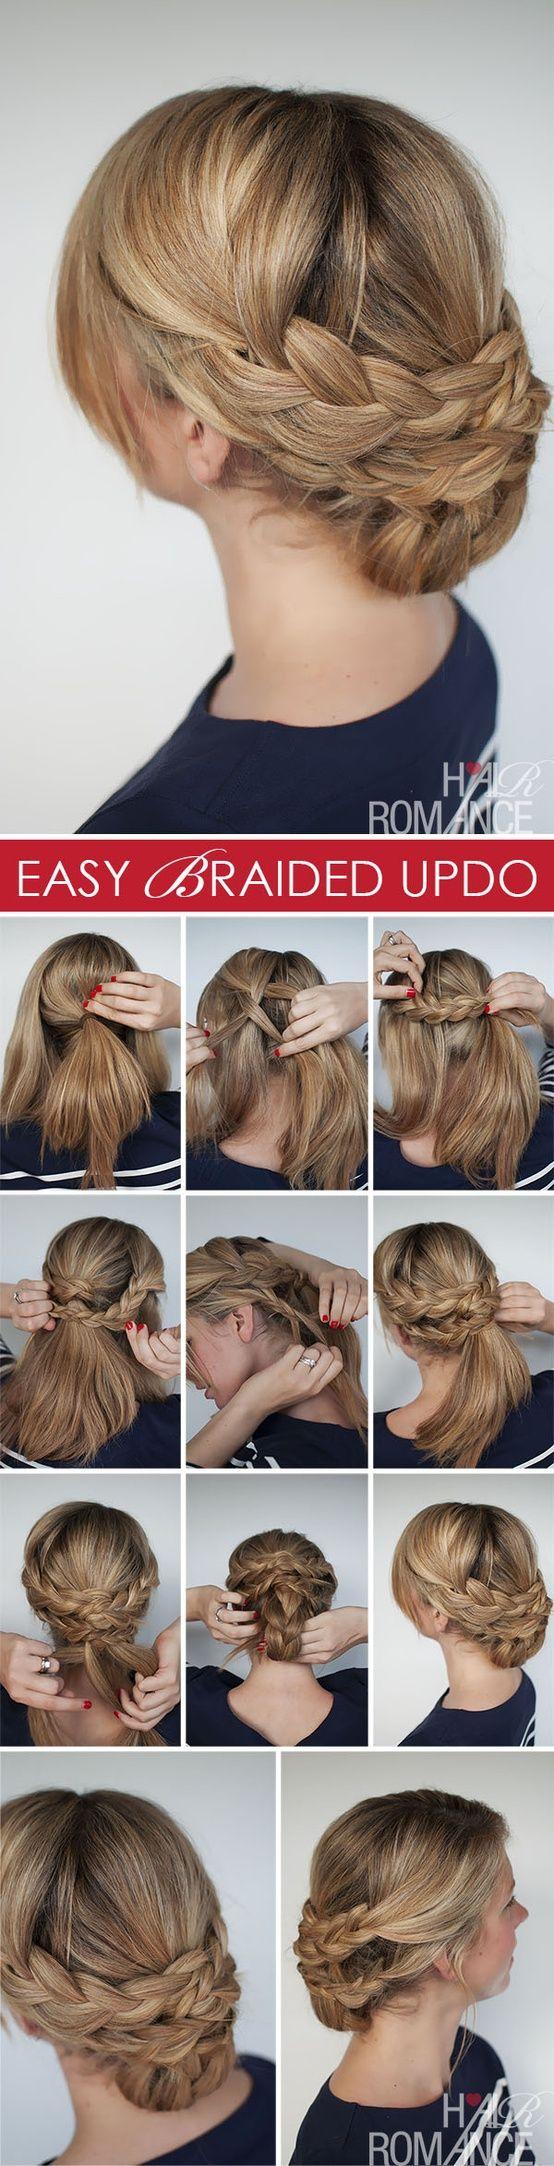 pretty braided updo